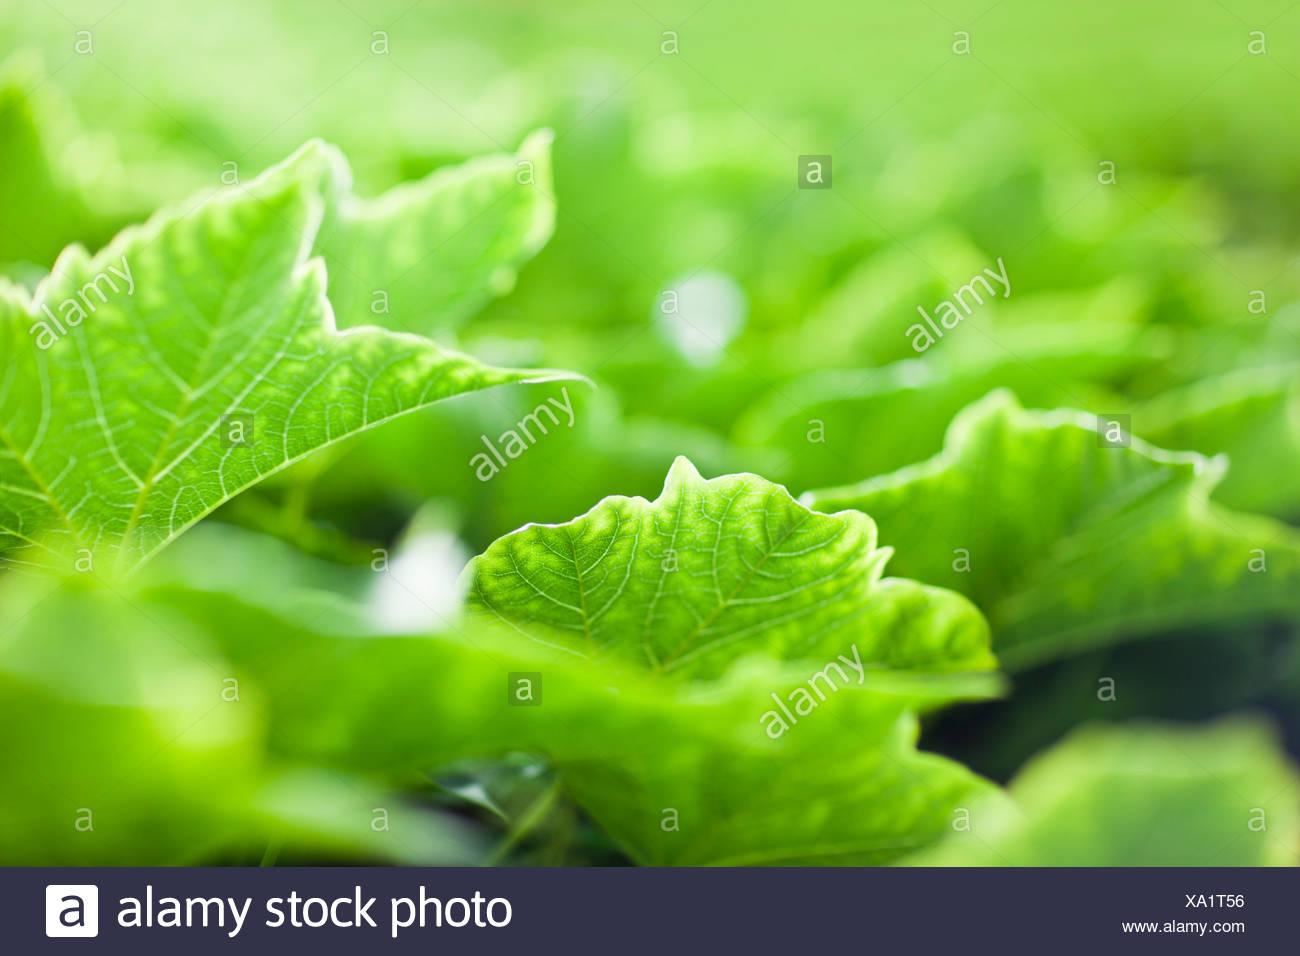 Greenery - Stock Image